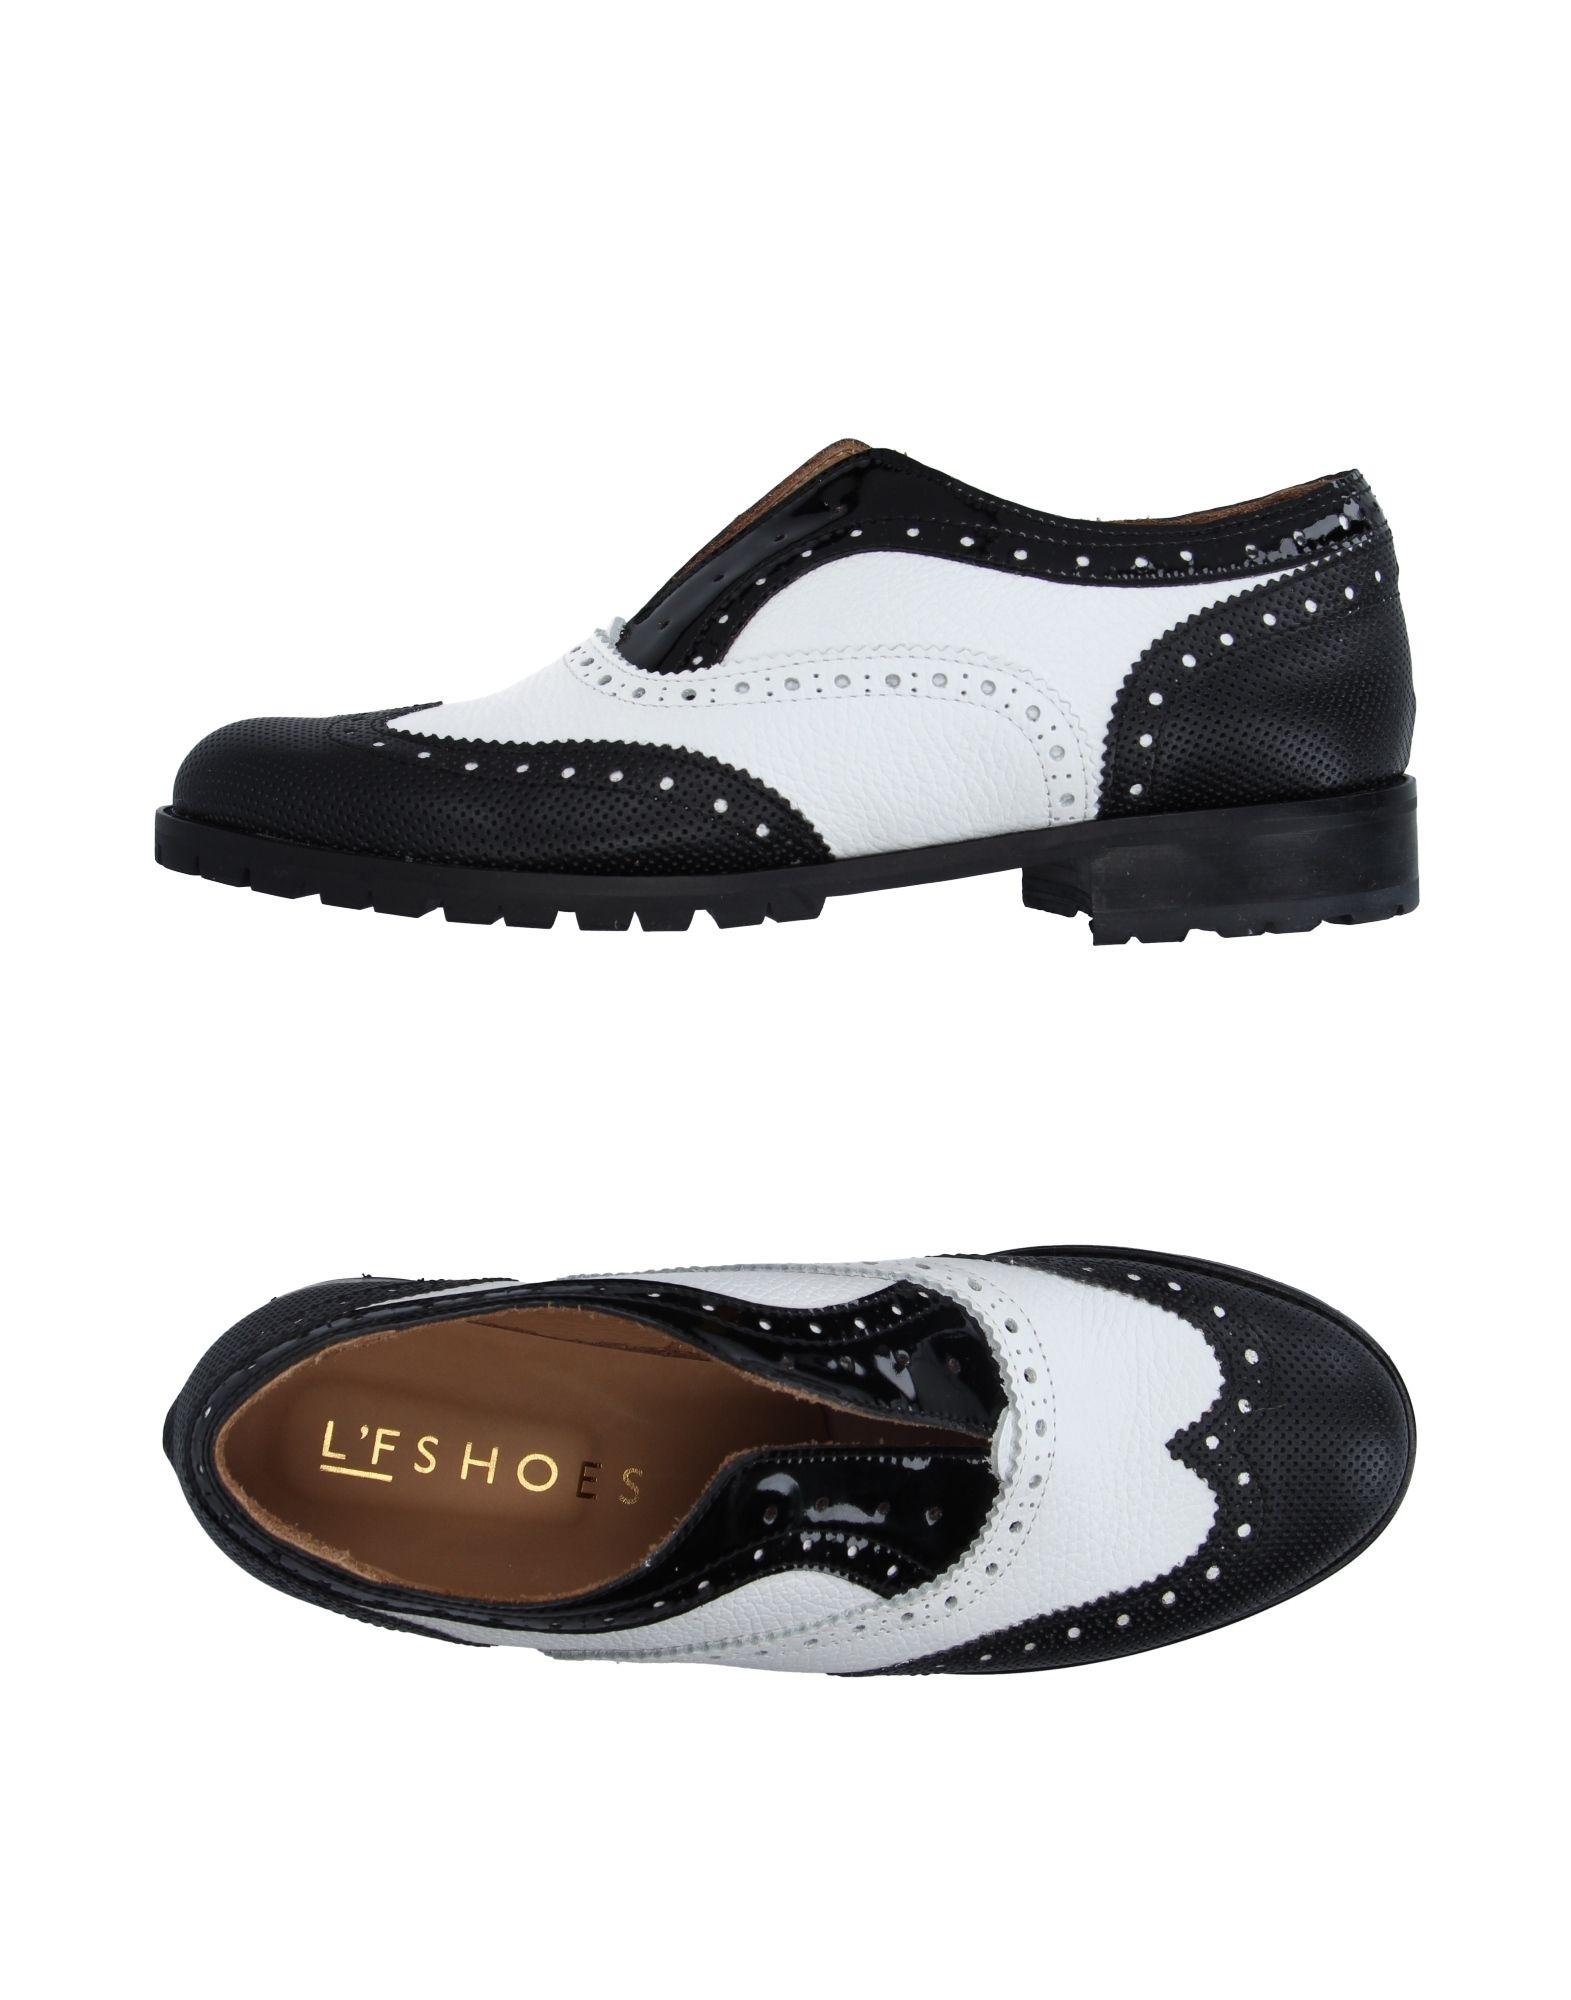 L'f Shoes Mokassins Damen  11188413PR Neue Schuhe